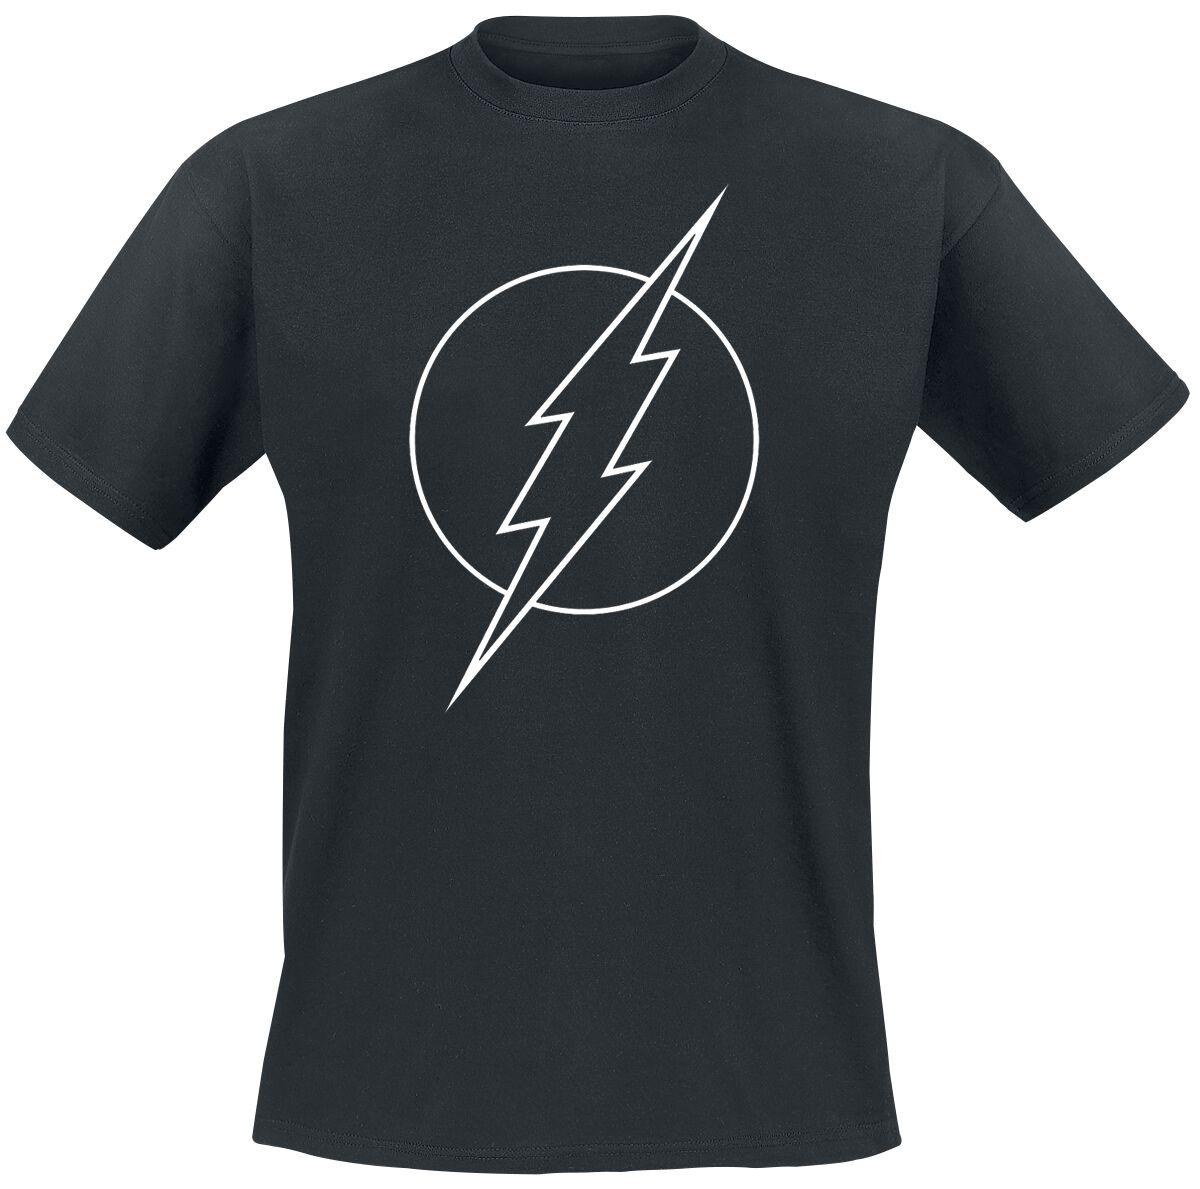 Merch dla Fanów - Koszulki - T-Shirt The Flash Logo T-Shirt czarny - 369621